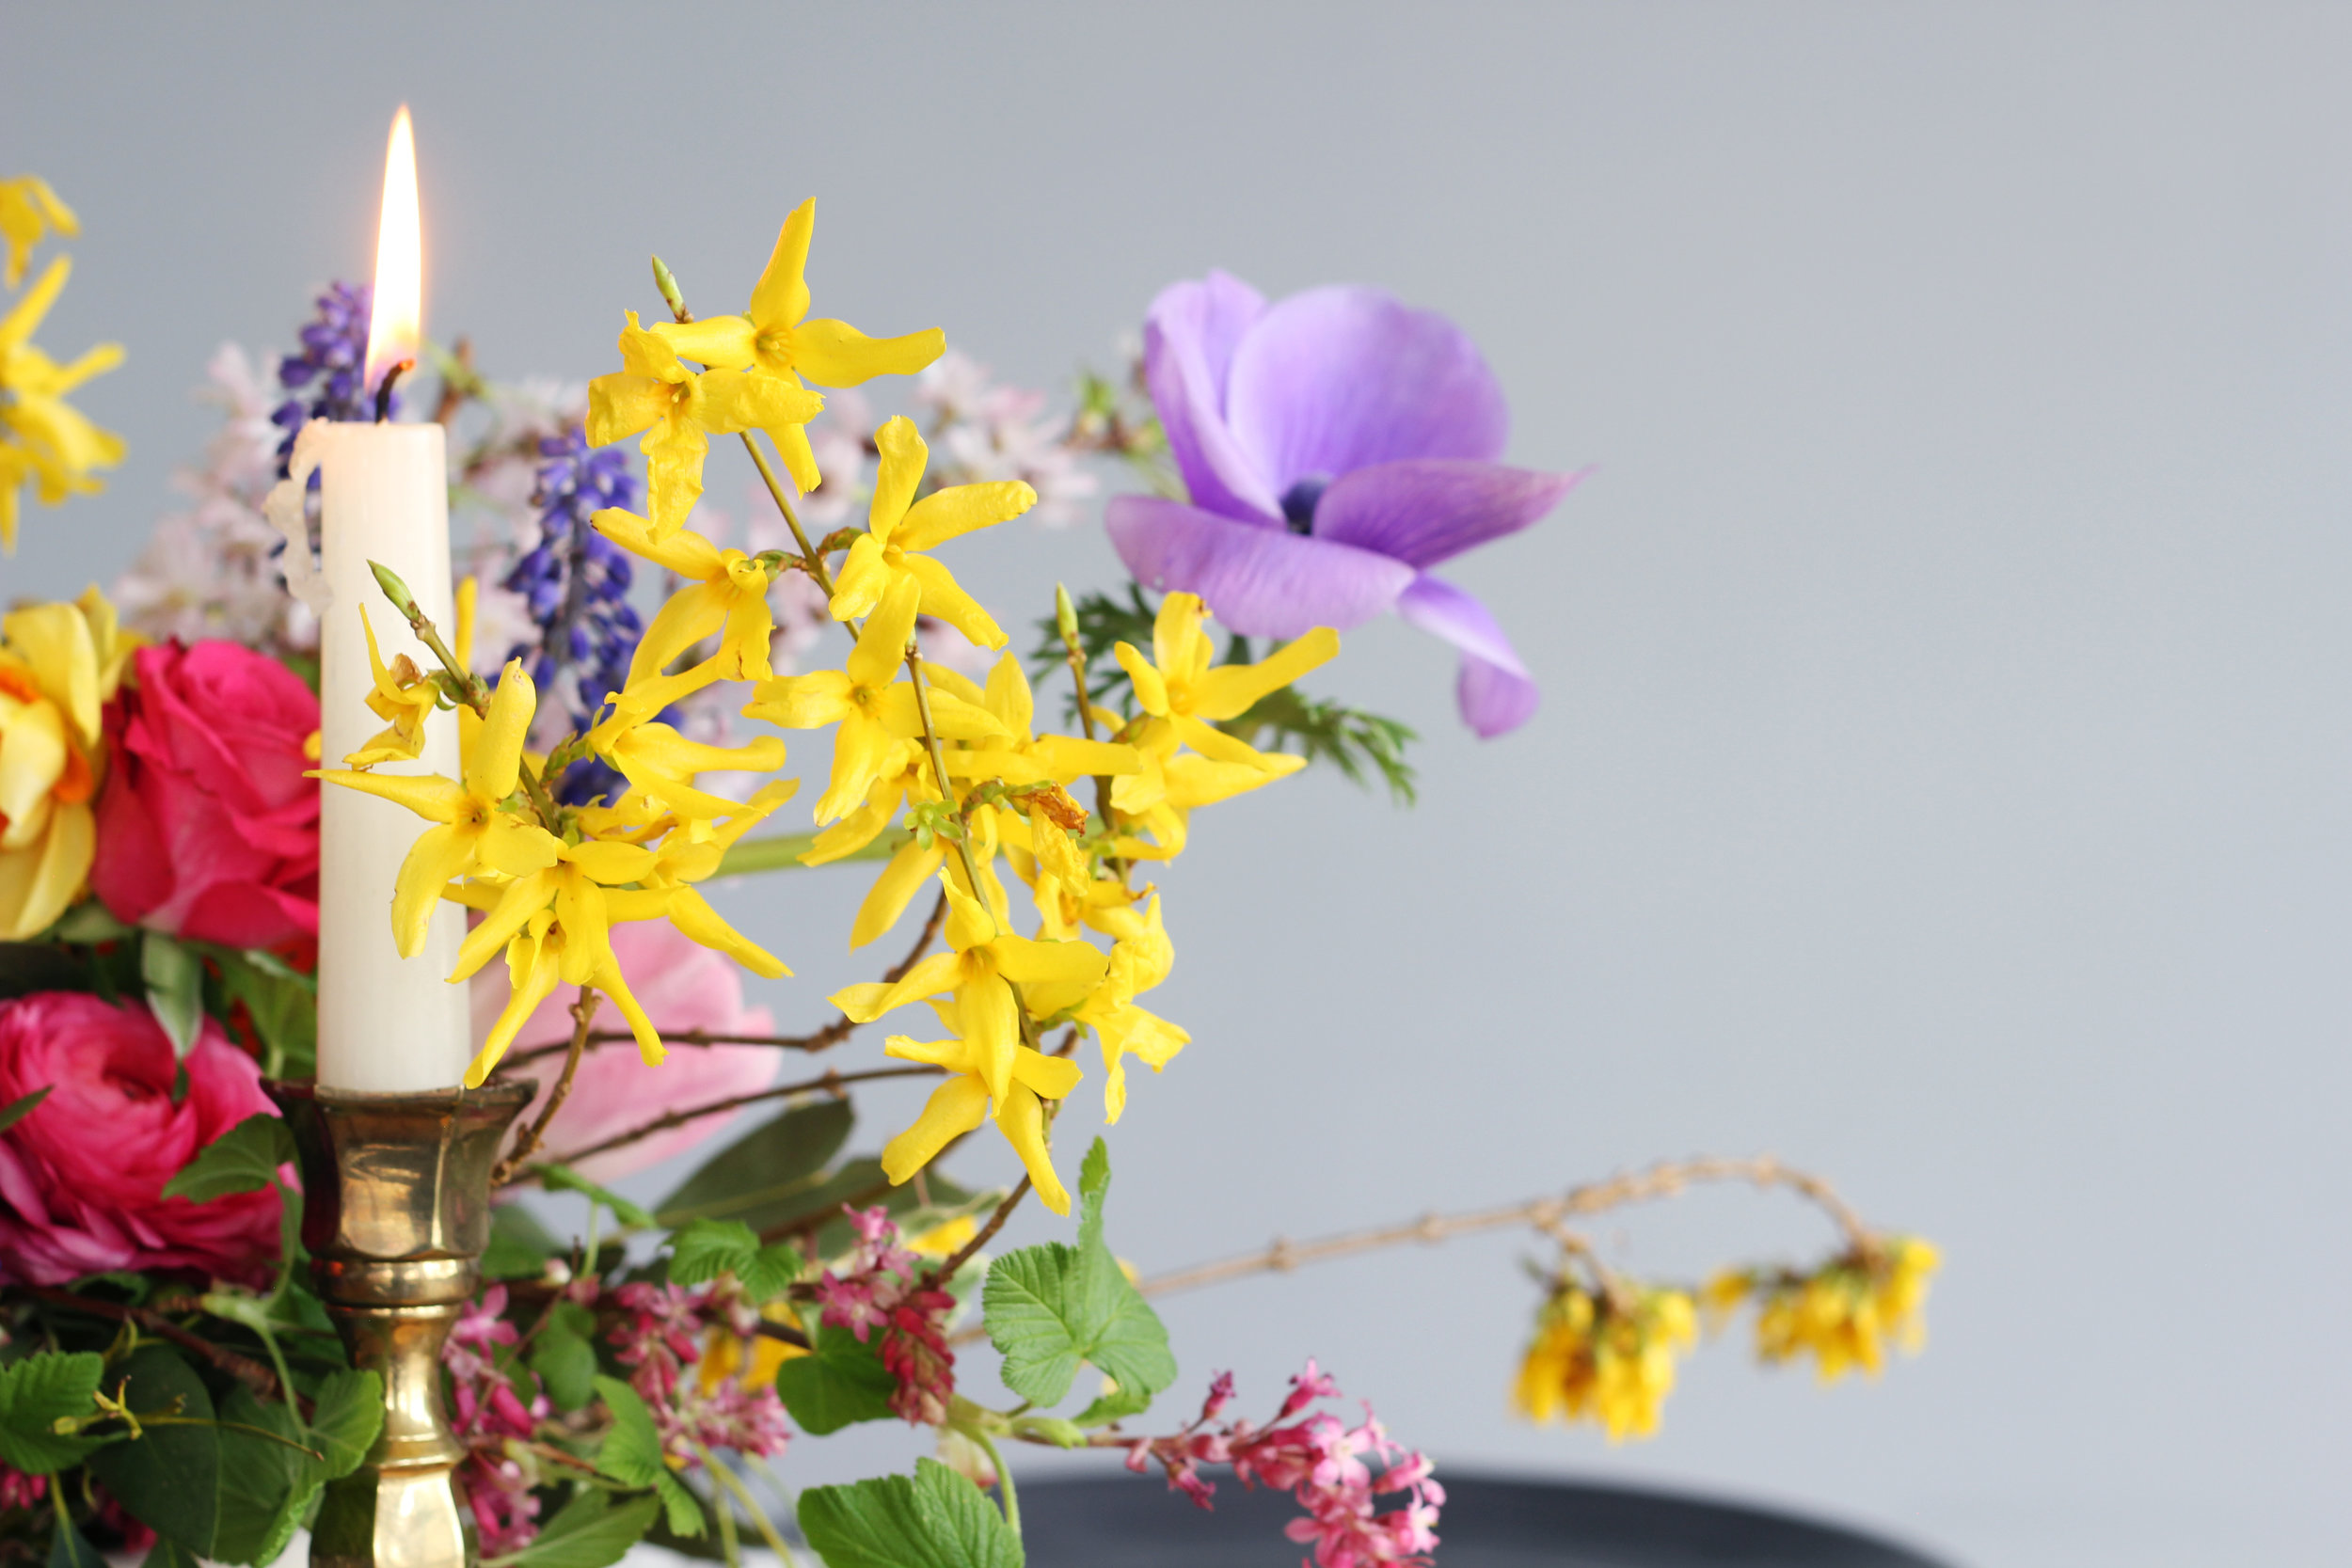 Callie-Pettigrew-Fruity-Florals-26.jpg